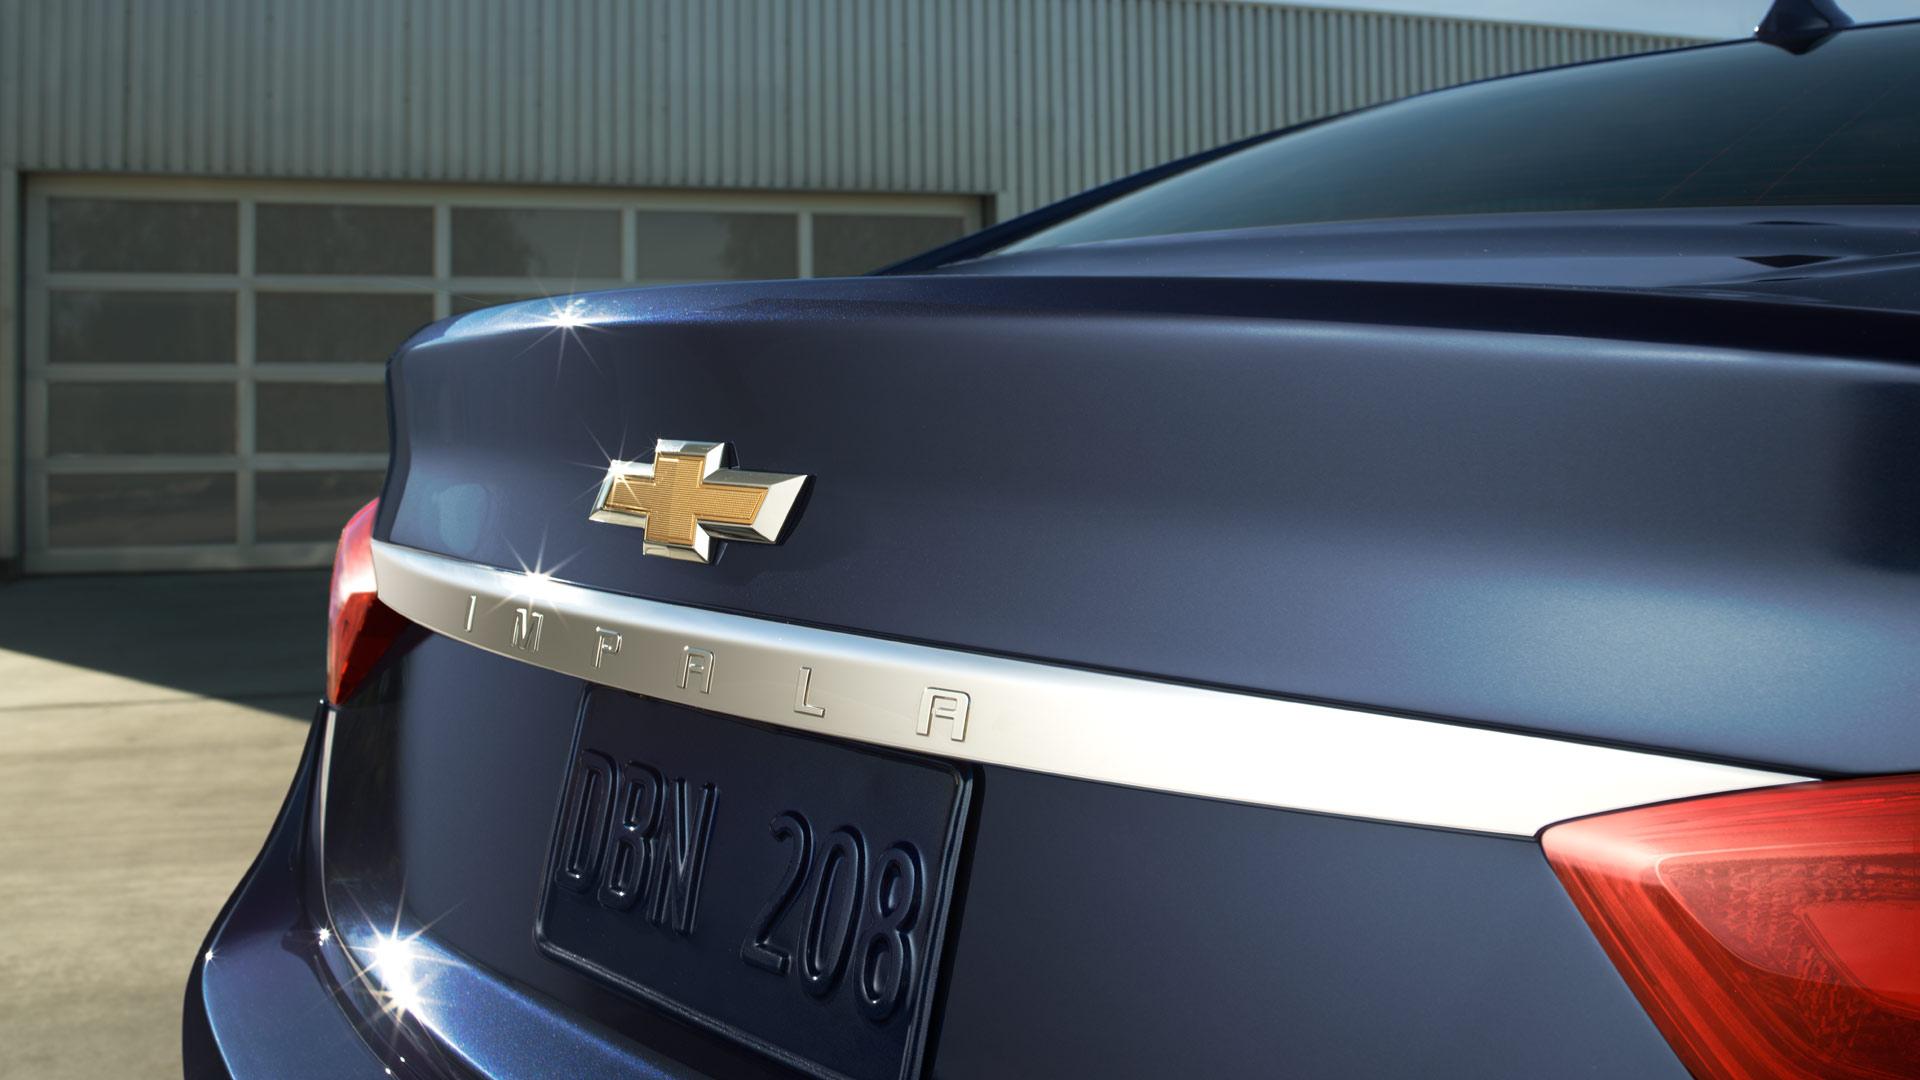 Chevy Impala III